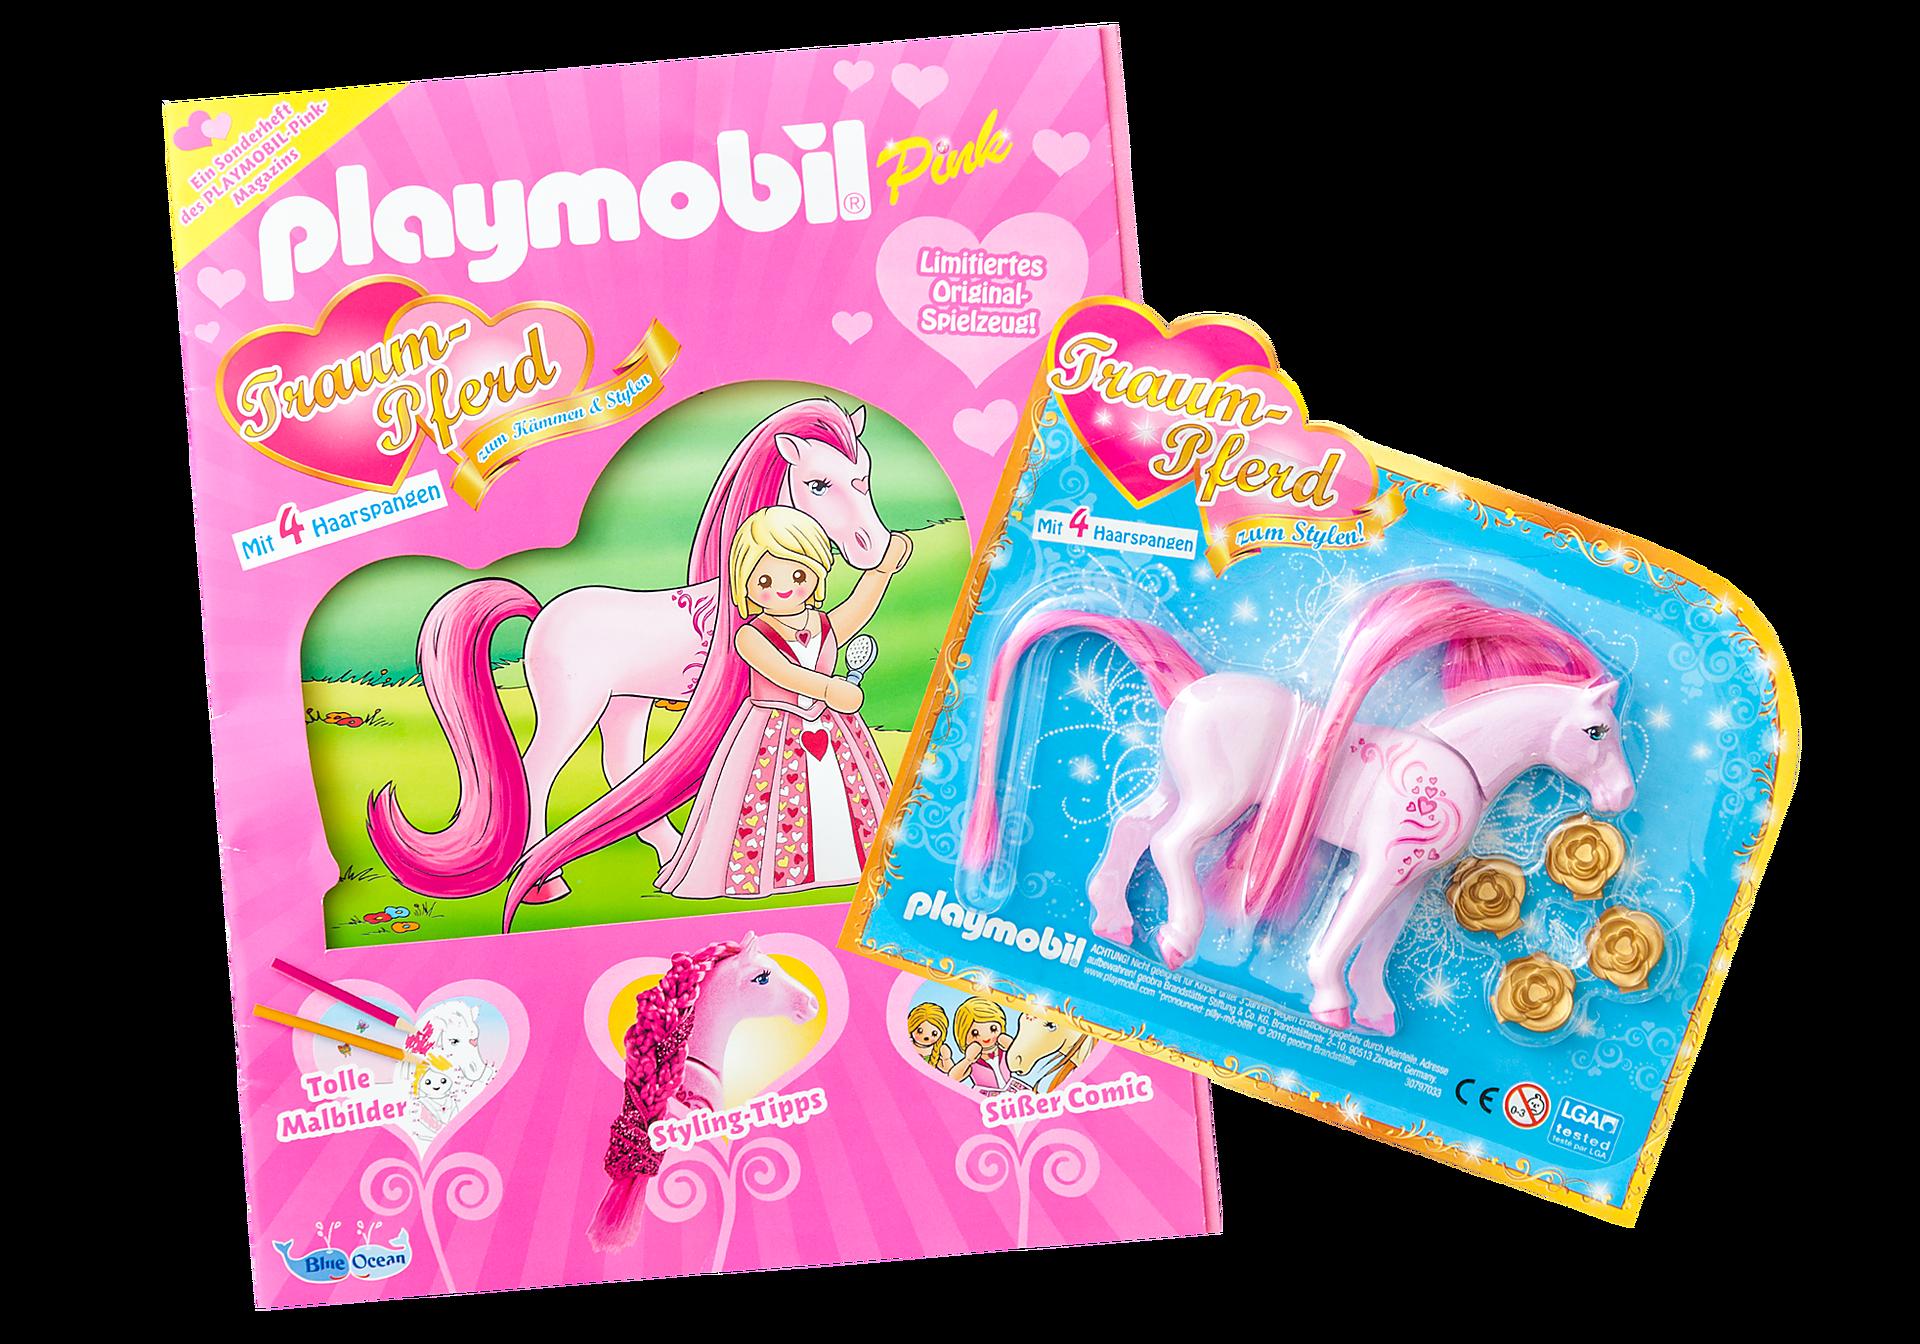 80576 PLAYMOBIL-Magazin Pink Sonderheft 2016 zoom image1